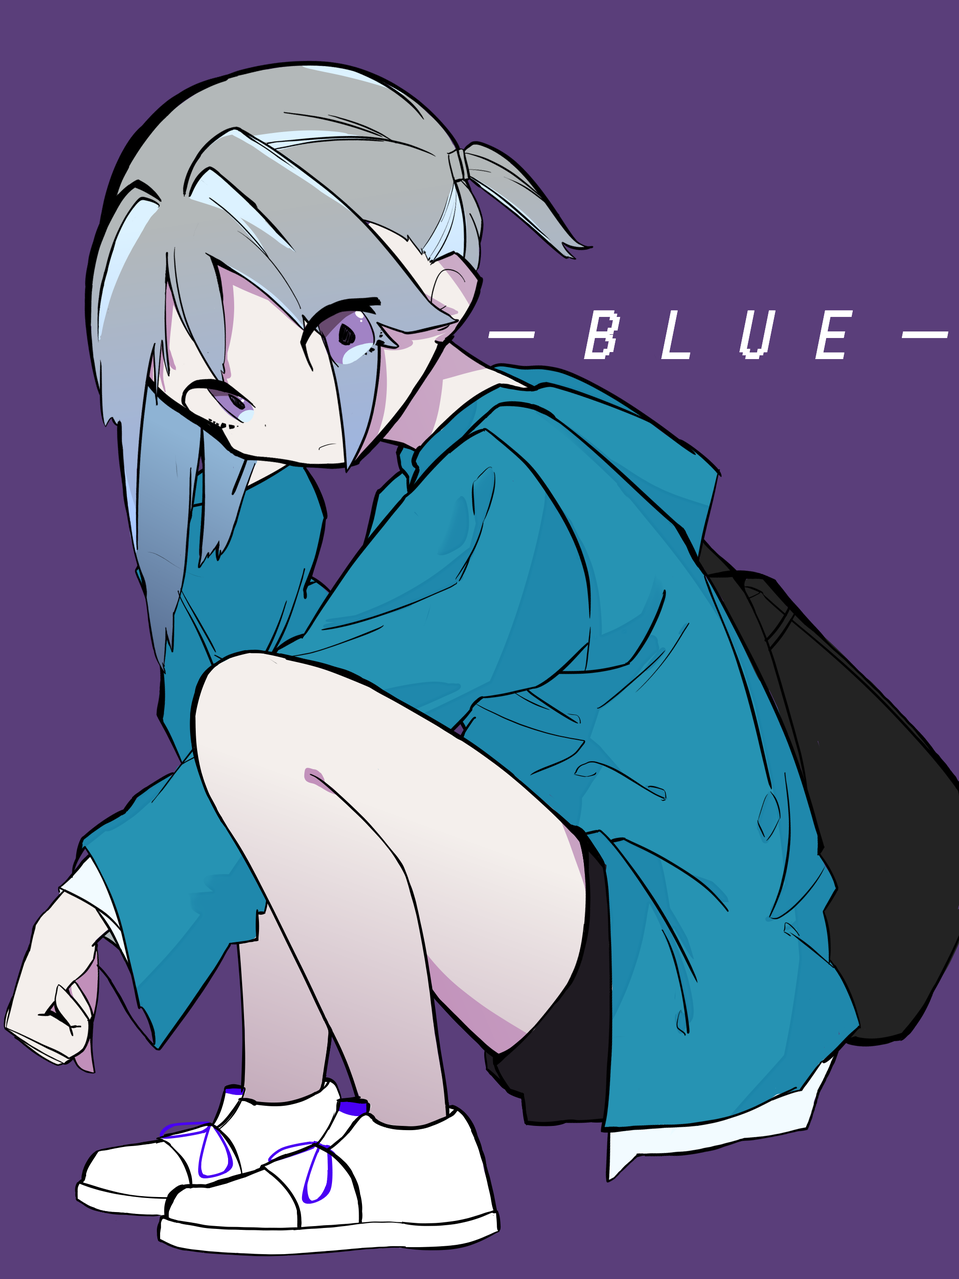 BLUE Illust of えいみん medibangpaint